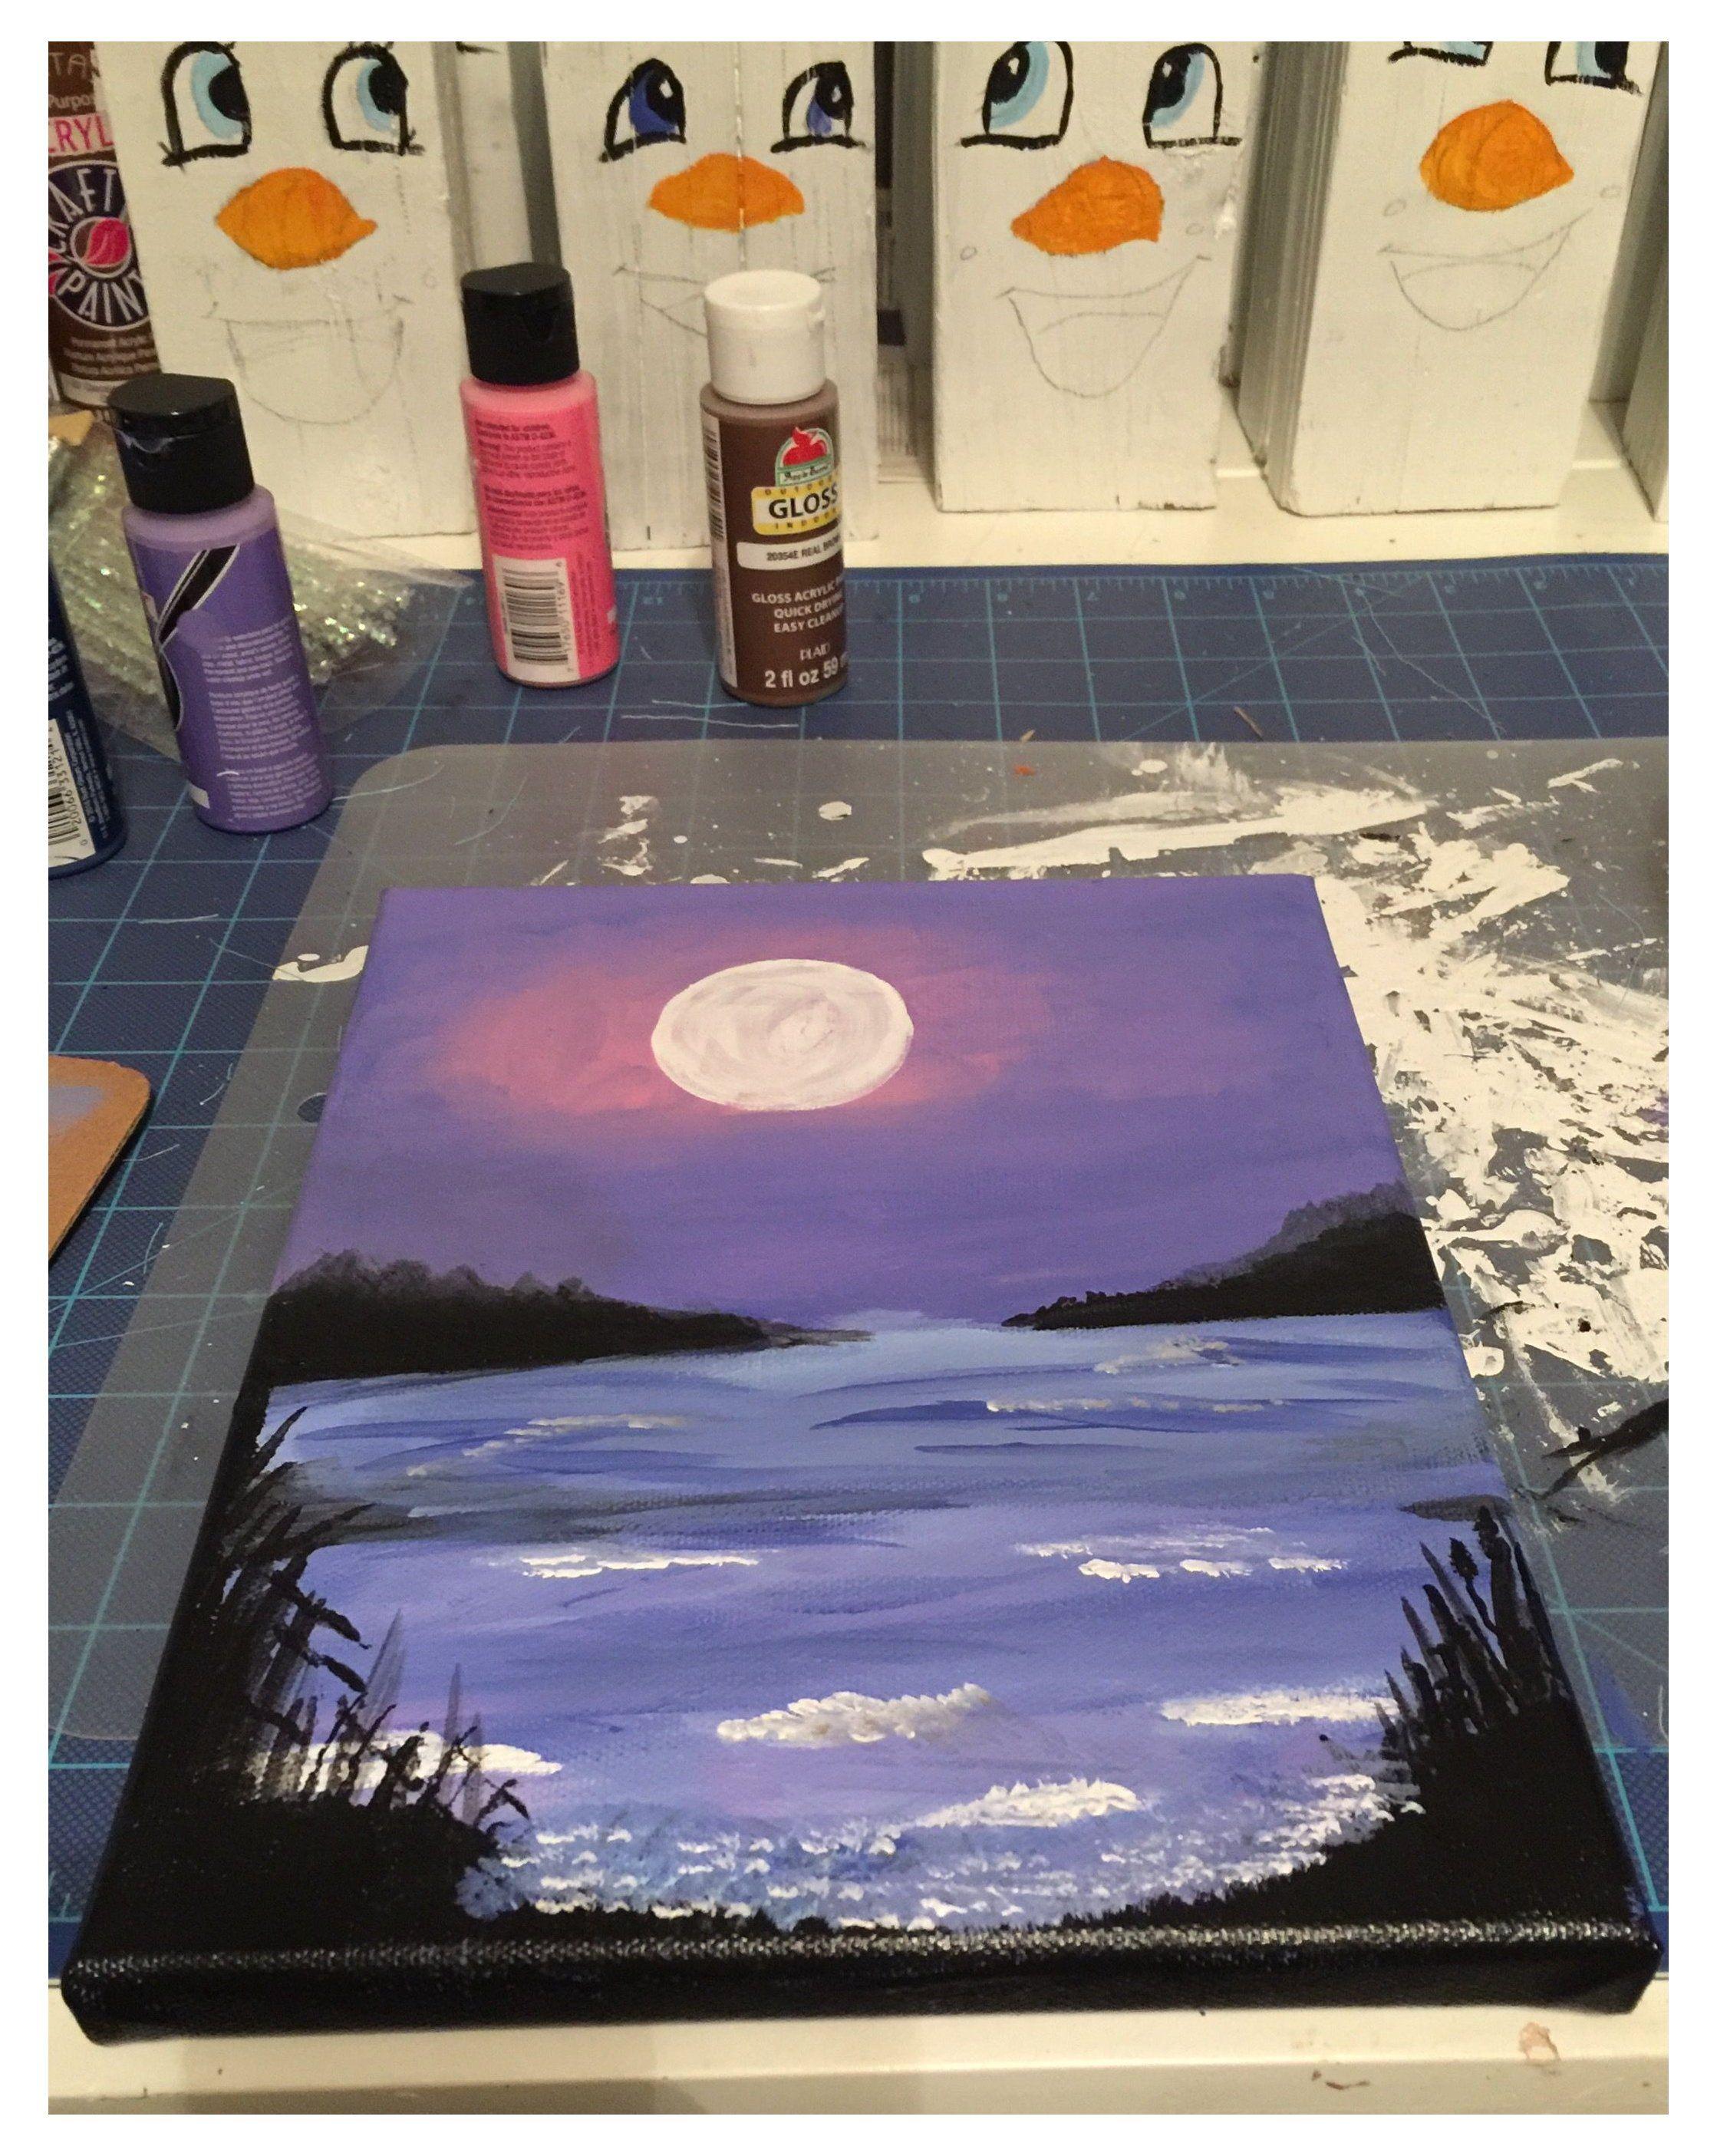 Acrylic Painting Aesthetic : acrylic, painting, aesthetic, Painting, #ideas, #canvas, #aesthetic, #purple, #paintingideasoncanvasaestheticpurple, Purple, Night, Canvas, Paintings,, Painting,